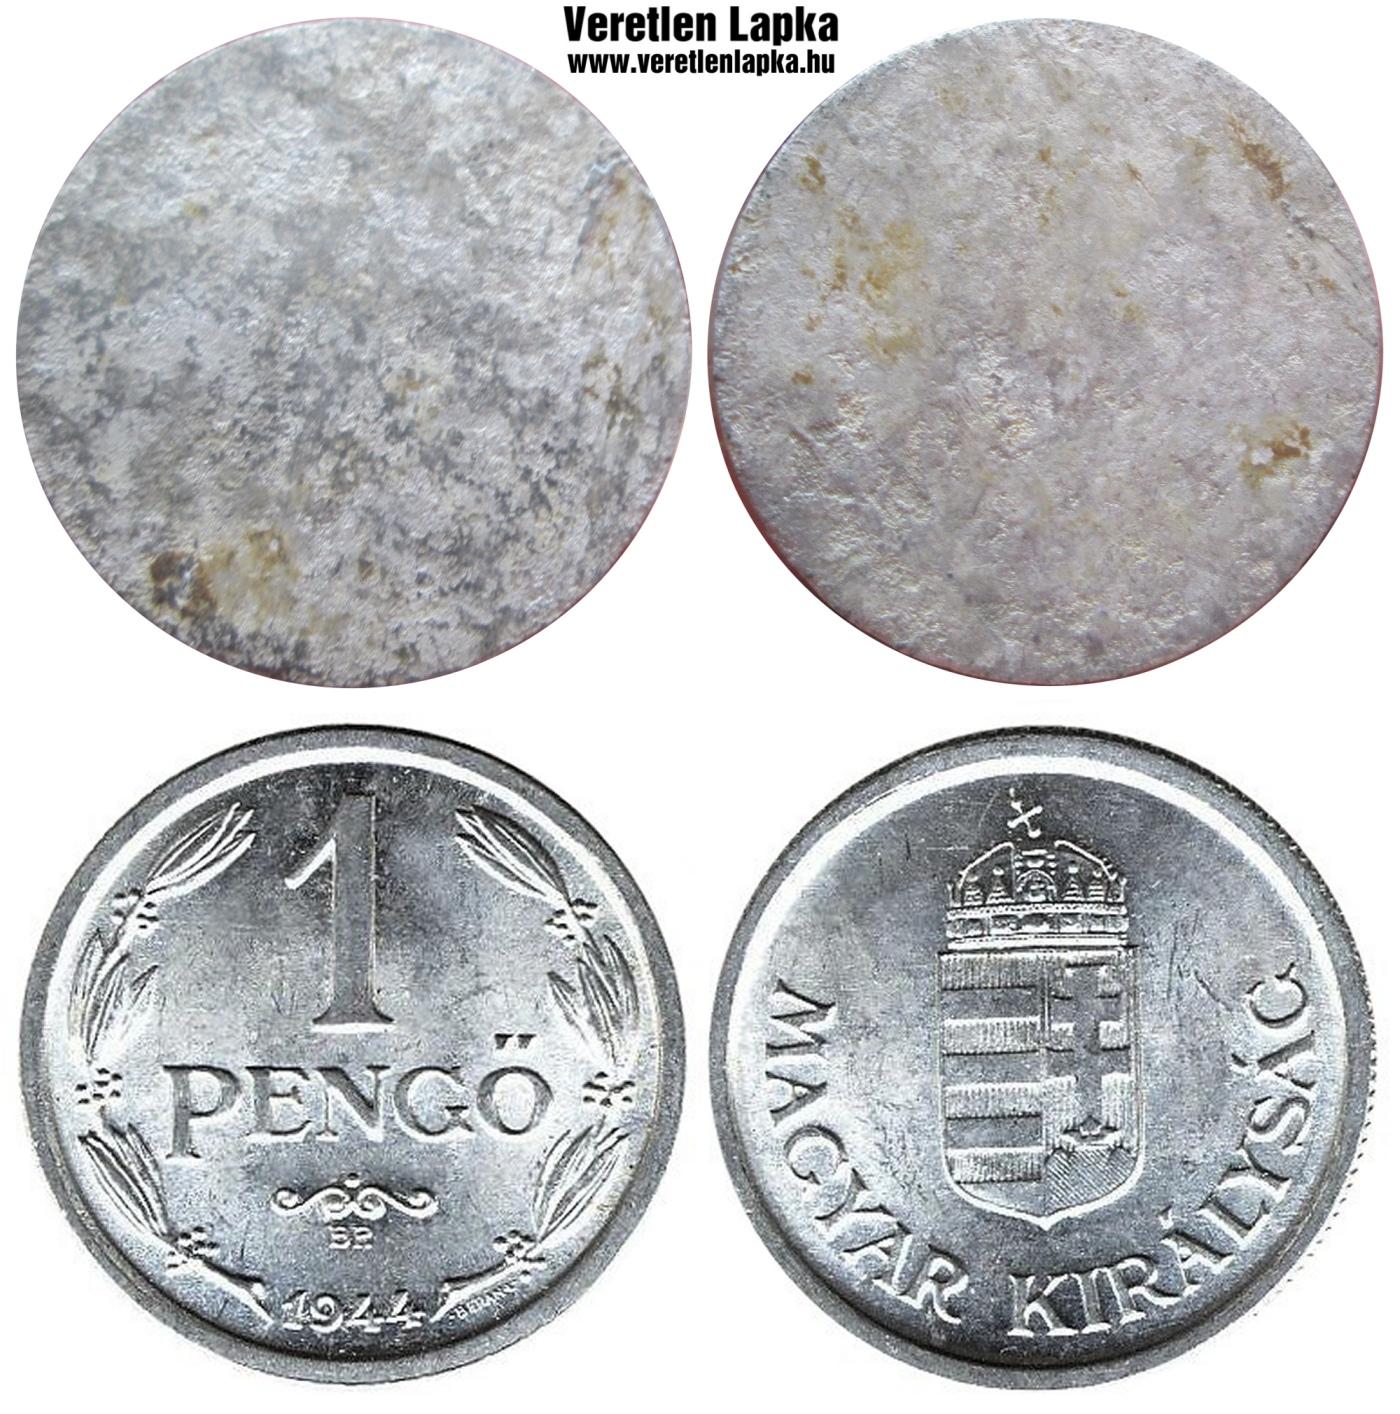 http://www.veretlenlapka.hu/veretlenlapkak/pengo/www_veretlenlapka_hu_1_pengo_nyers-lapka_1941-1944_bozi-pengo-fertoboz.jpg